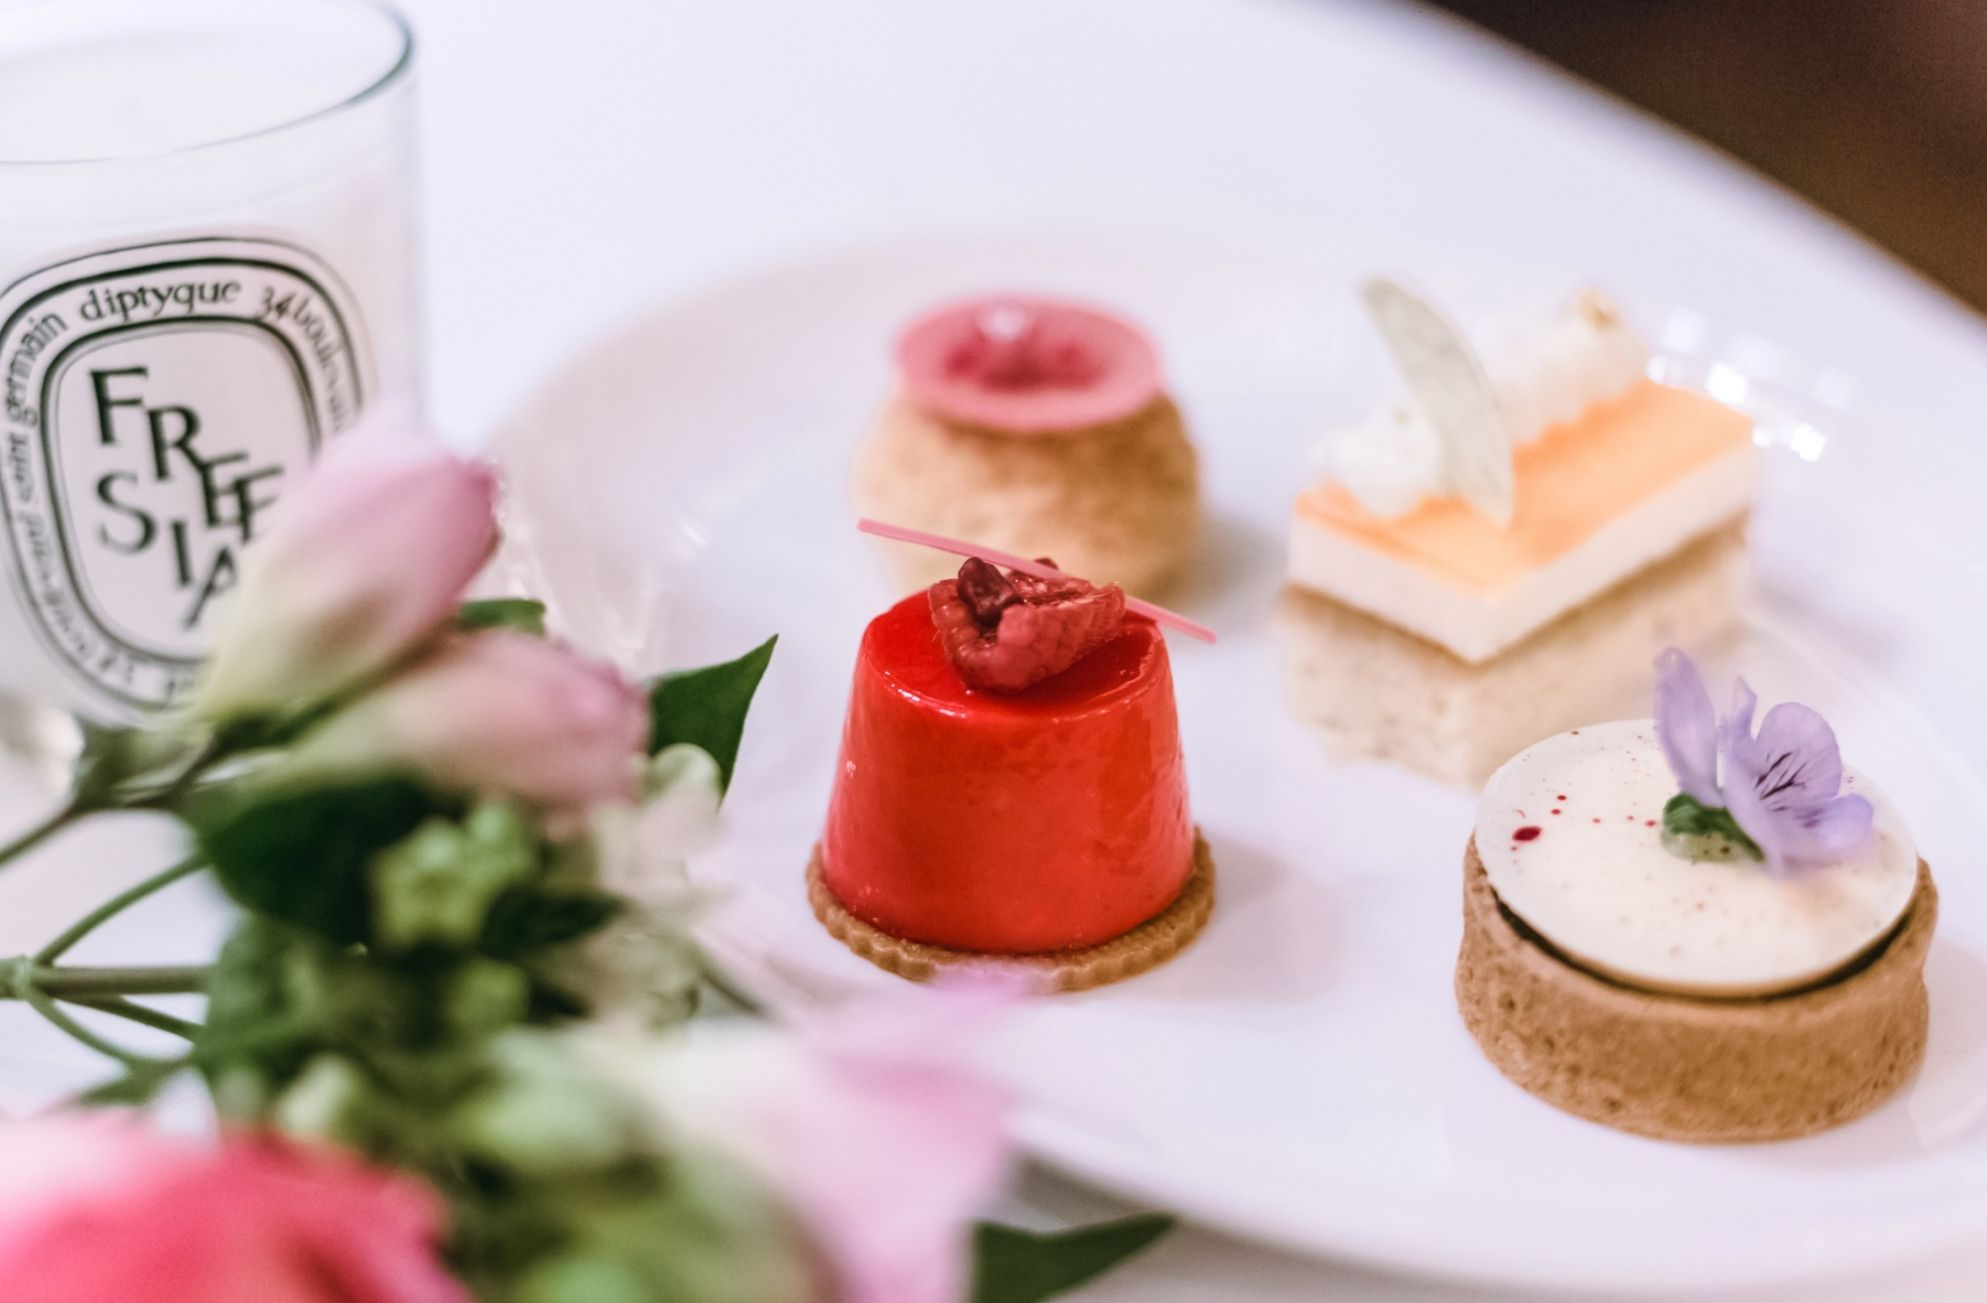 Hotel-Cafe-Royal---Diptyque-Spring-Afternoon-Tea-2018--4-.jpg